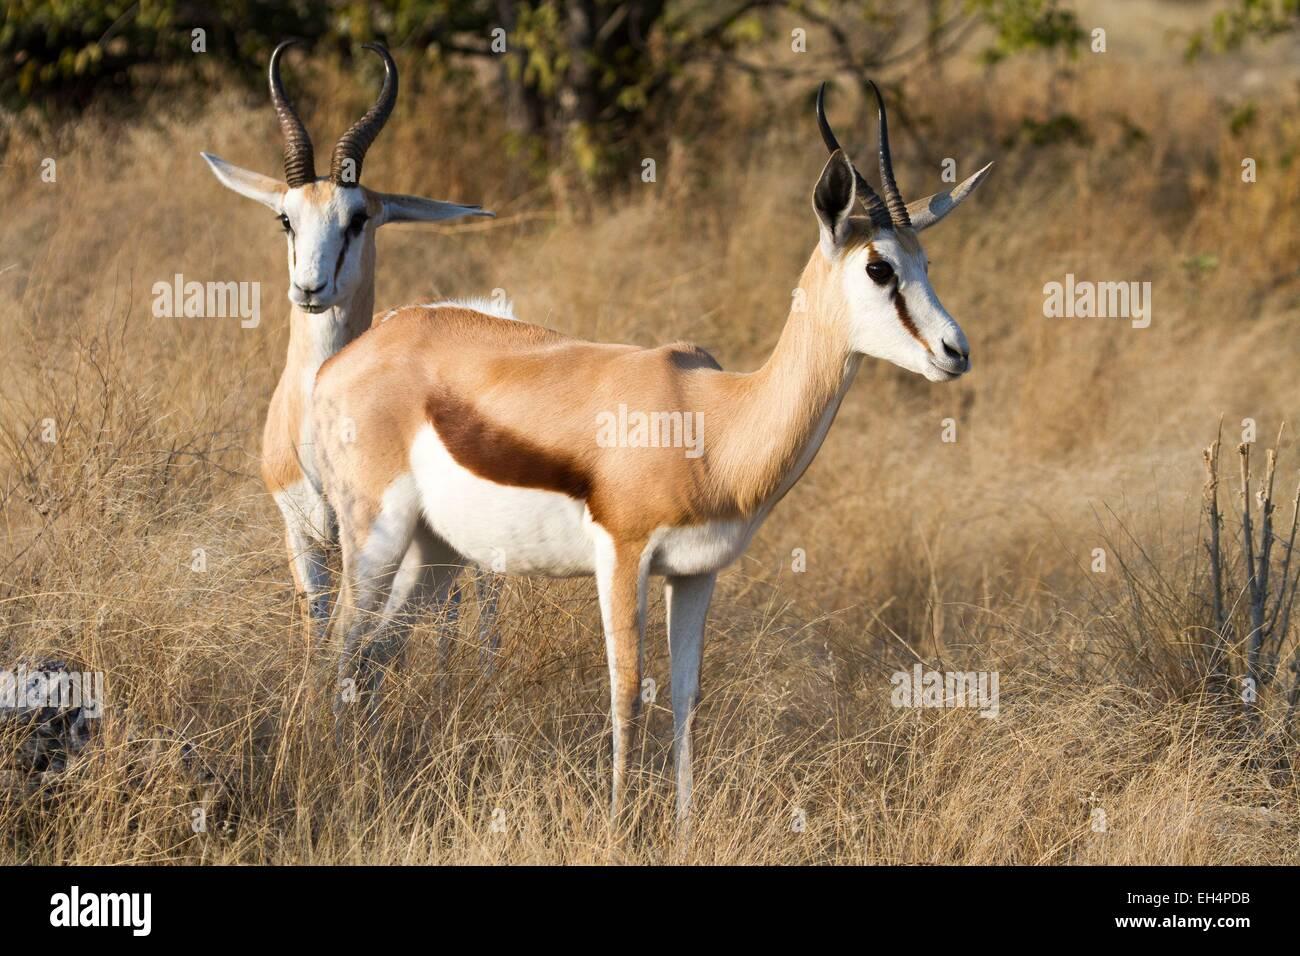 Namibia, Oshikoto region, Etosha National Park, springboks (Antidorcas marsupialis) - Stock Image